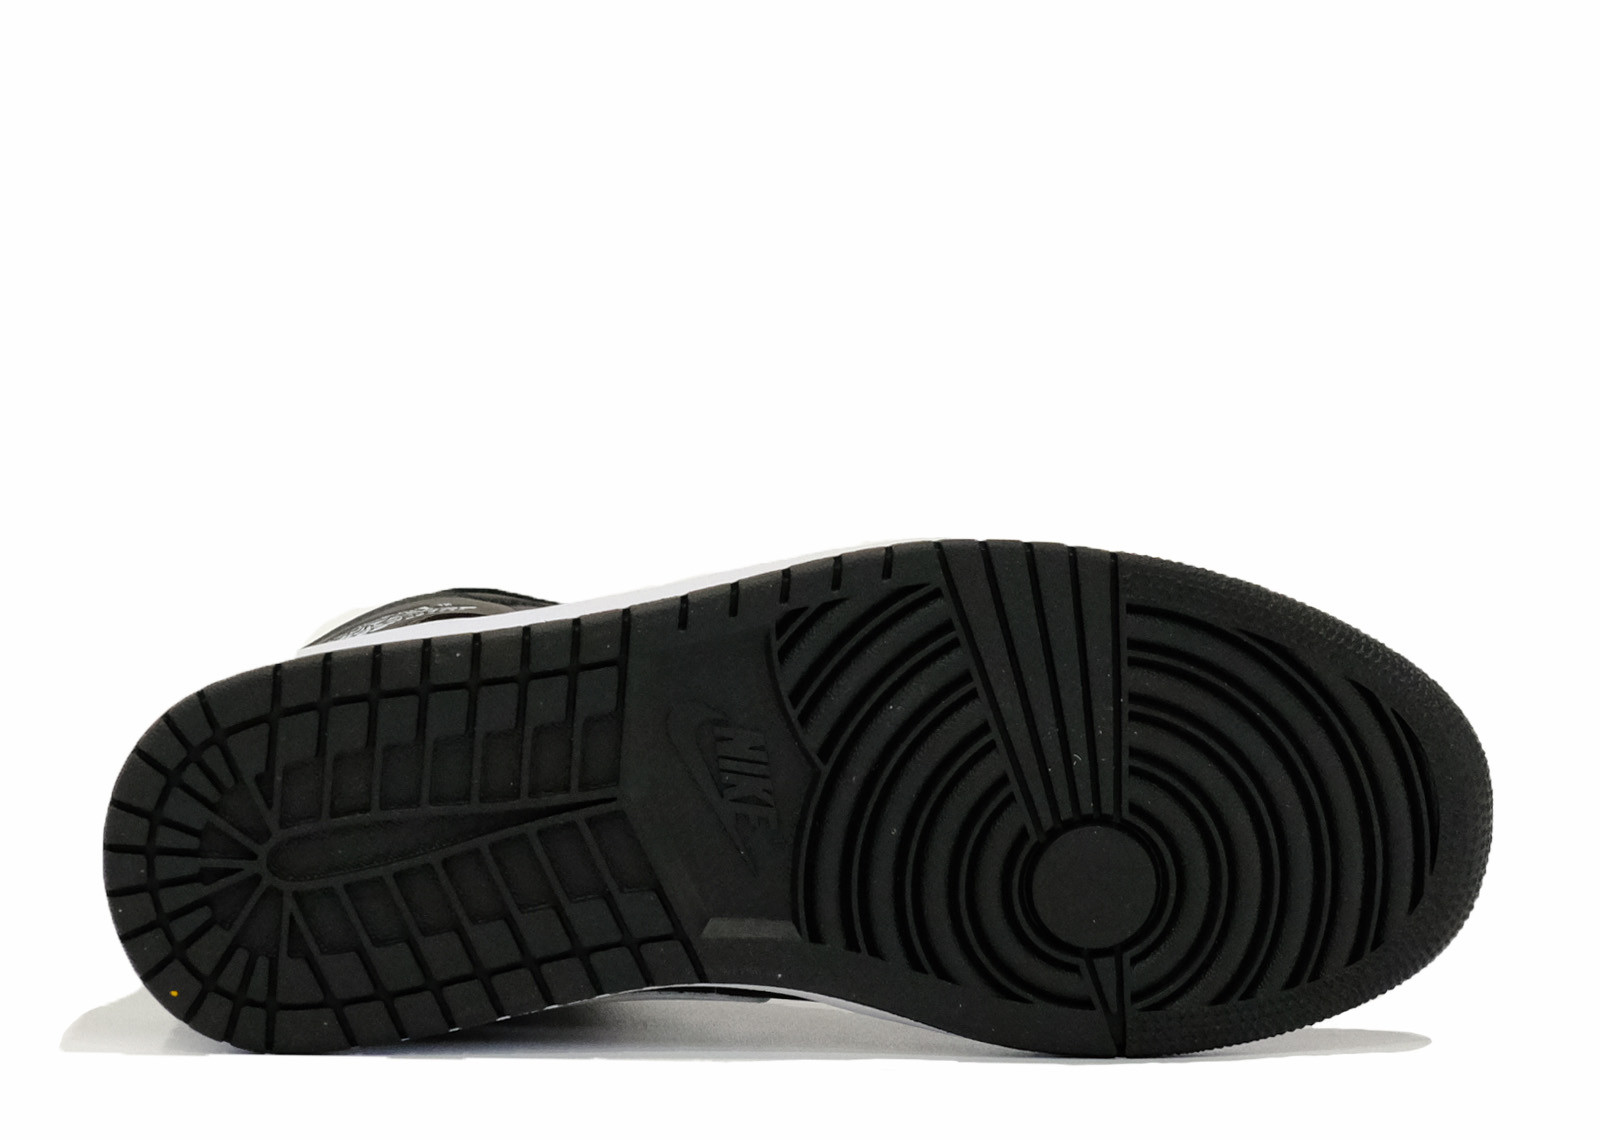 Air Jordan 1 Mid Black White image 4